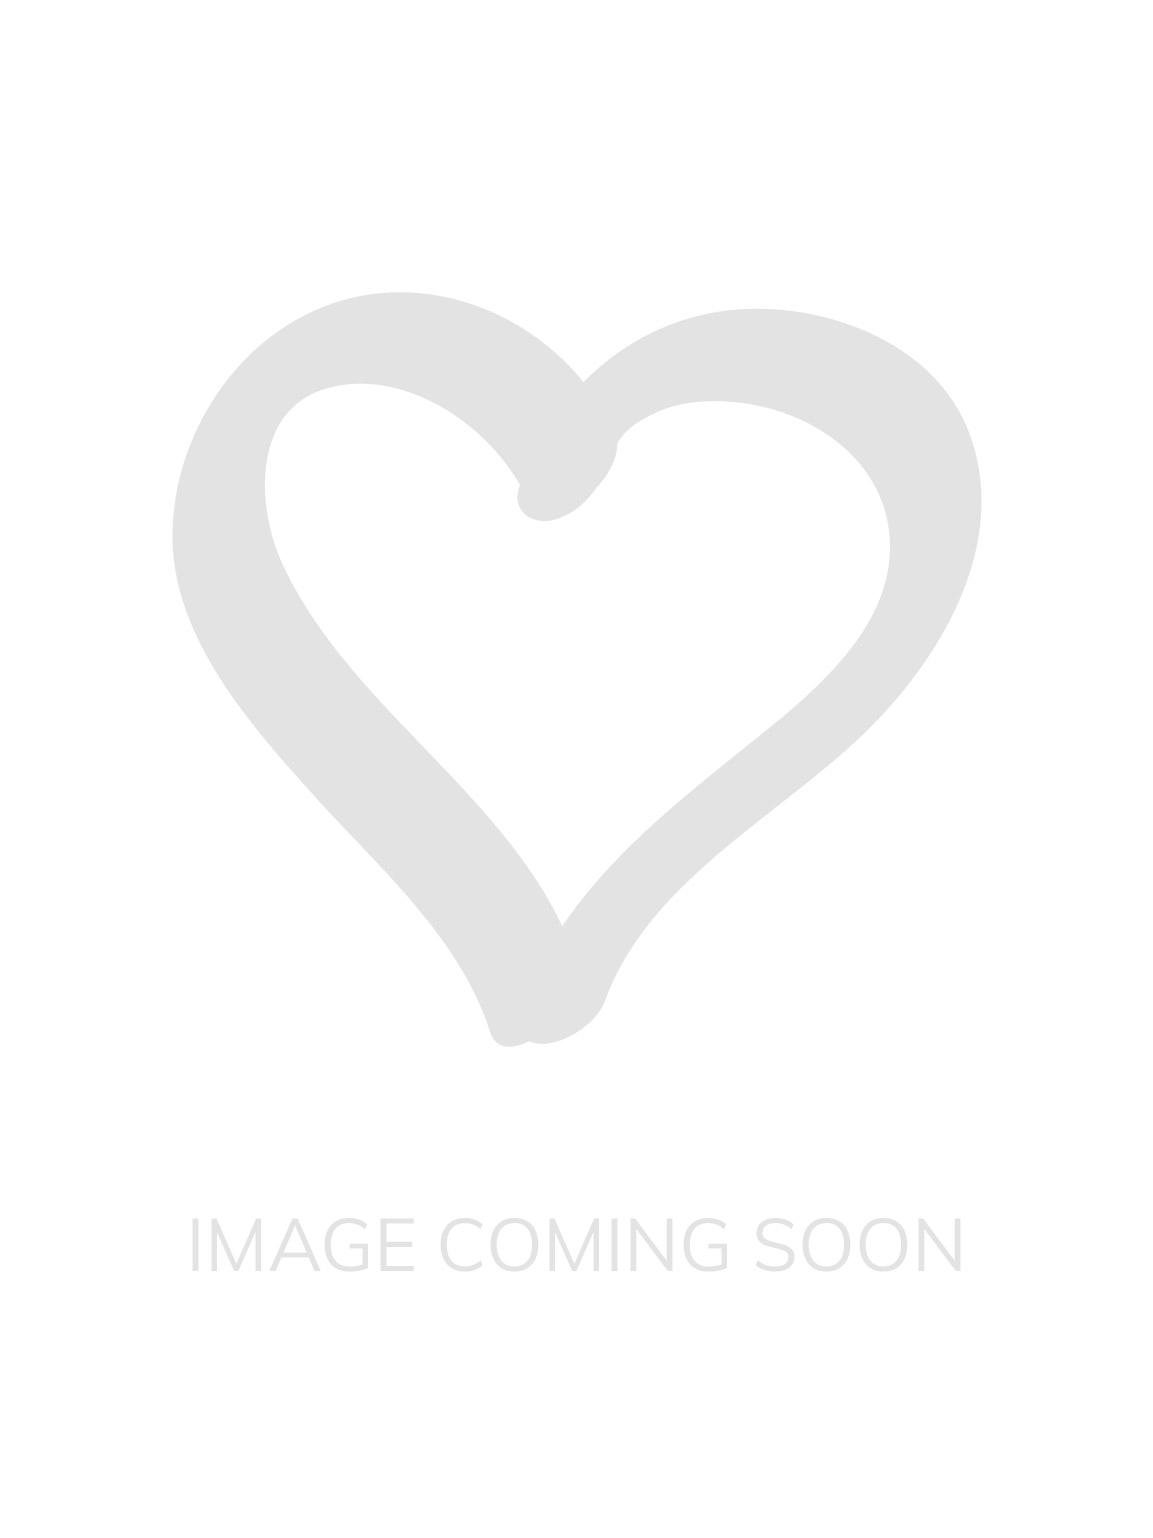 df765ee9be1ad Freya Soiree Lace Longline Bralette - White